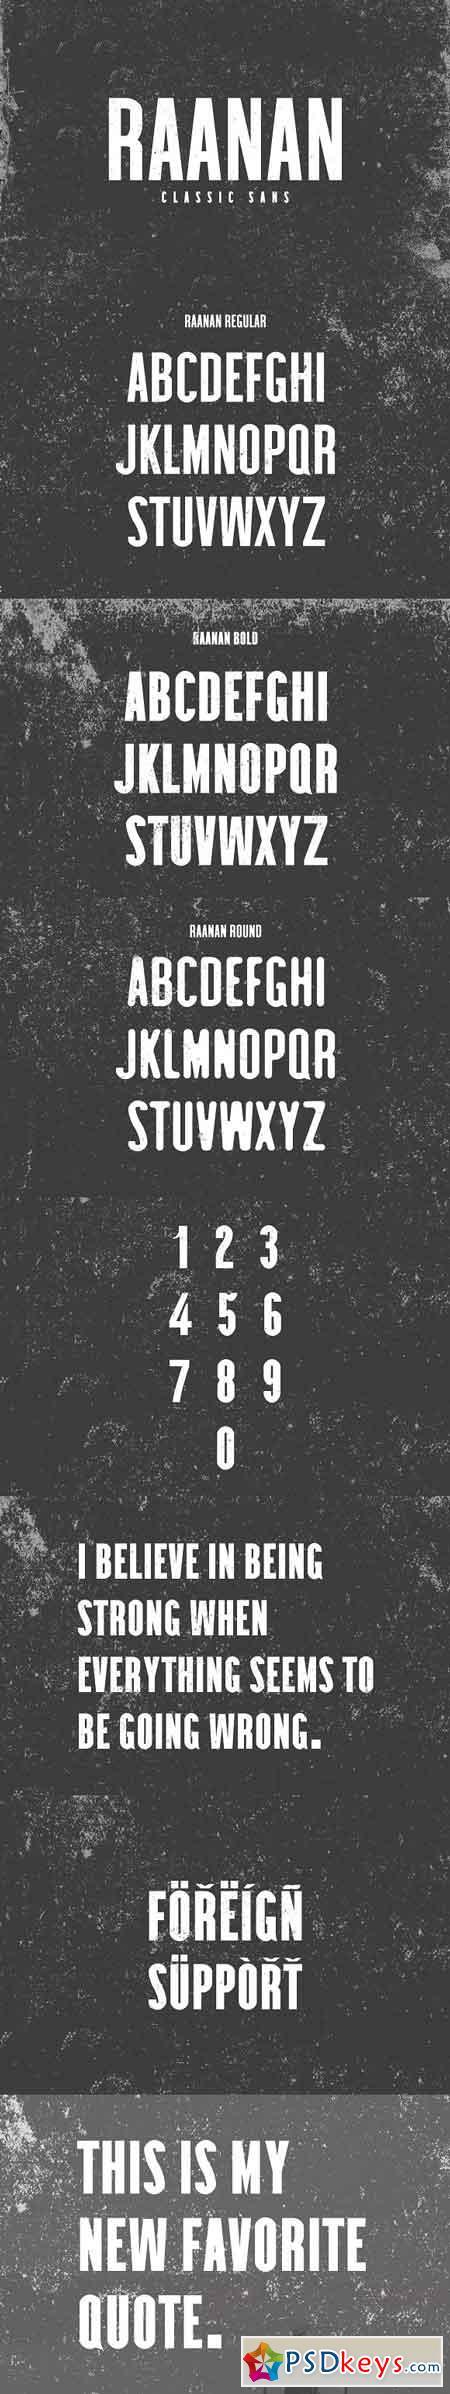 Raanan Classic Sans Serif Family 3188463